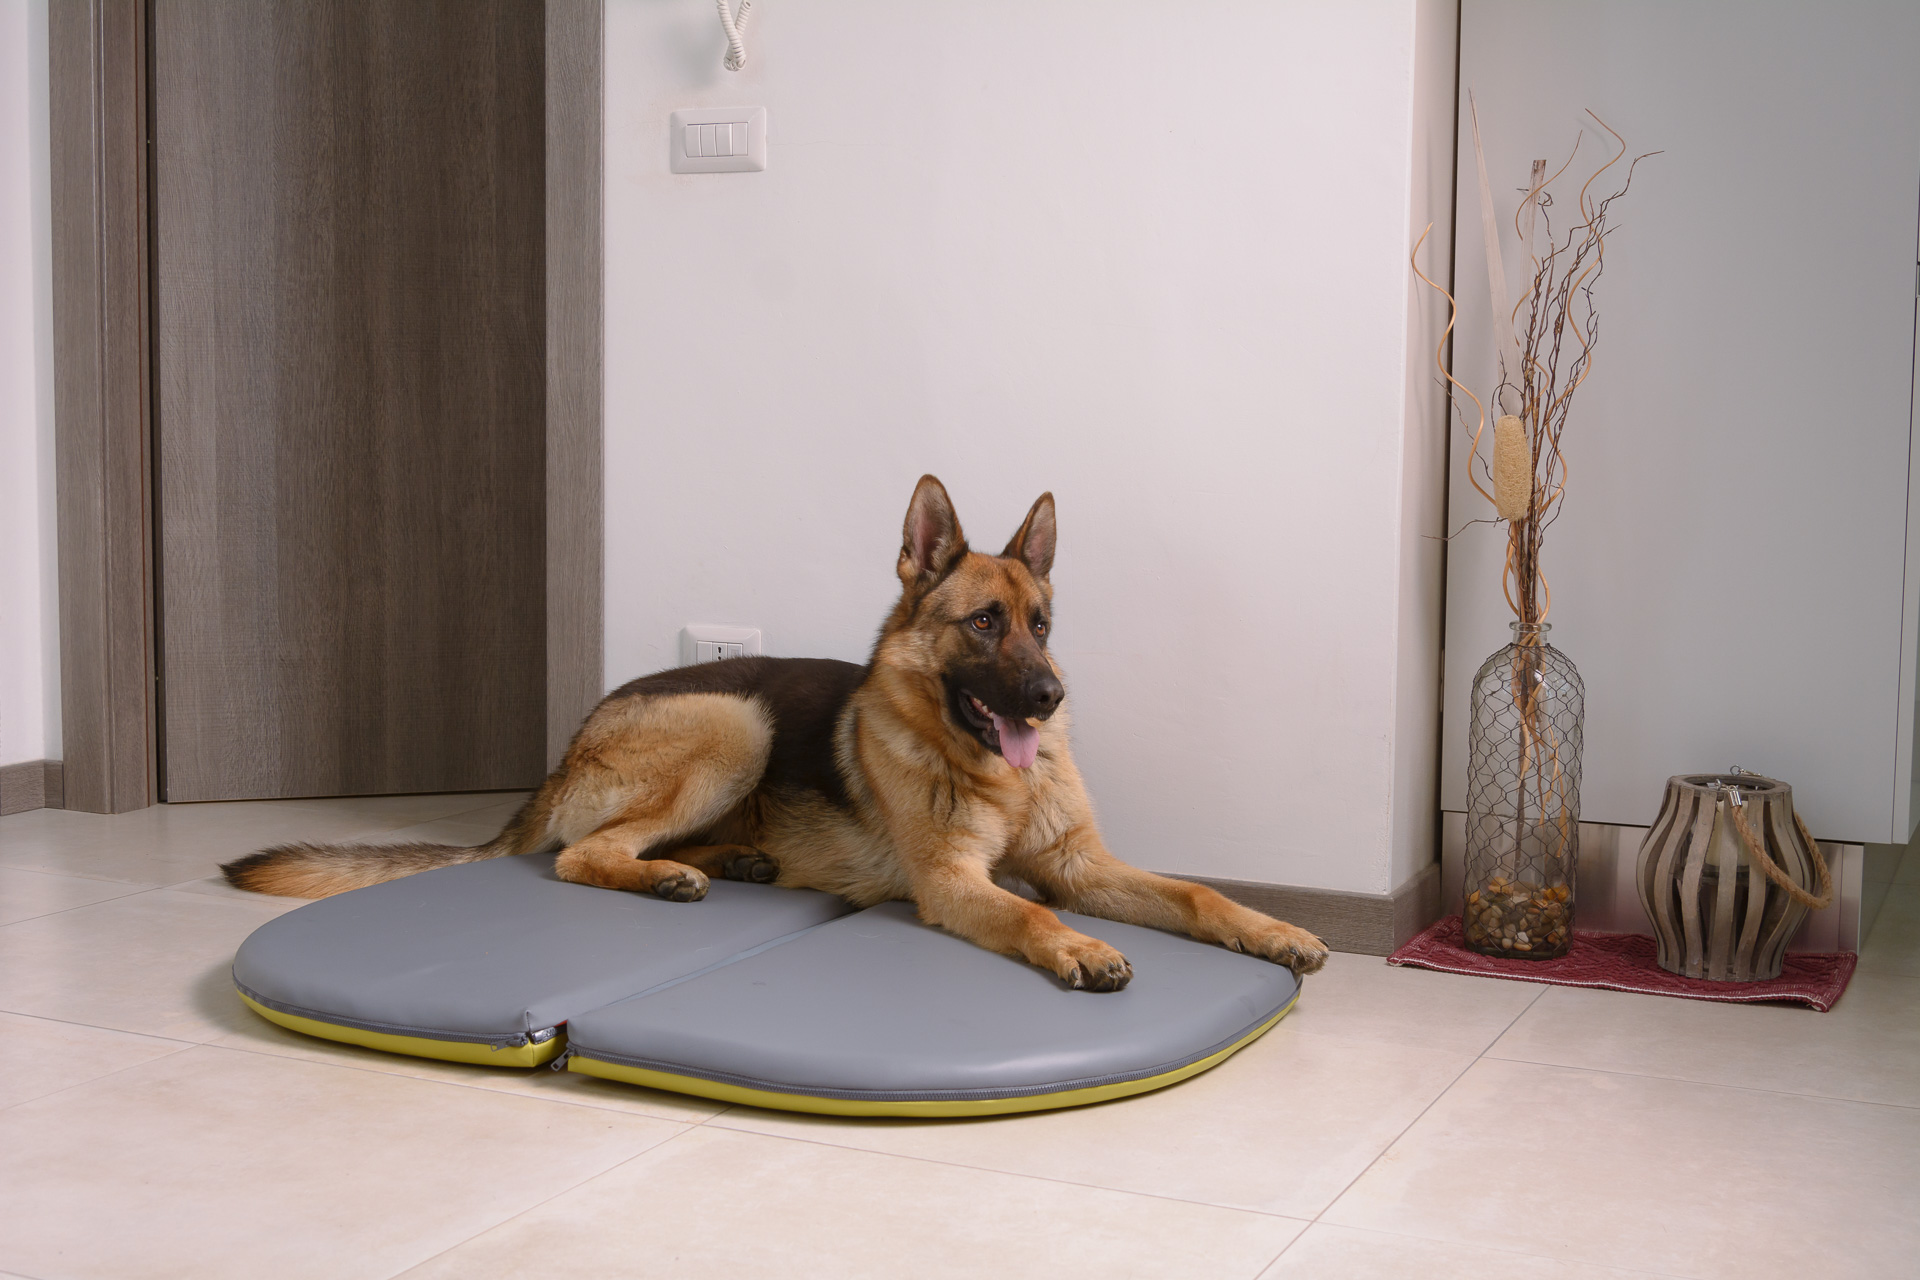 Cuscino gigante per cani